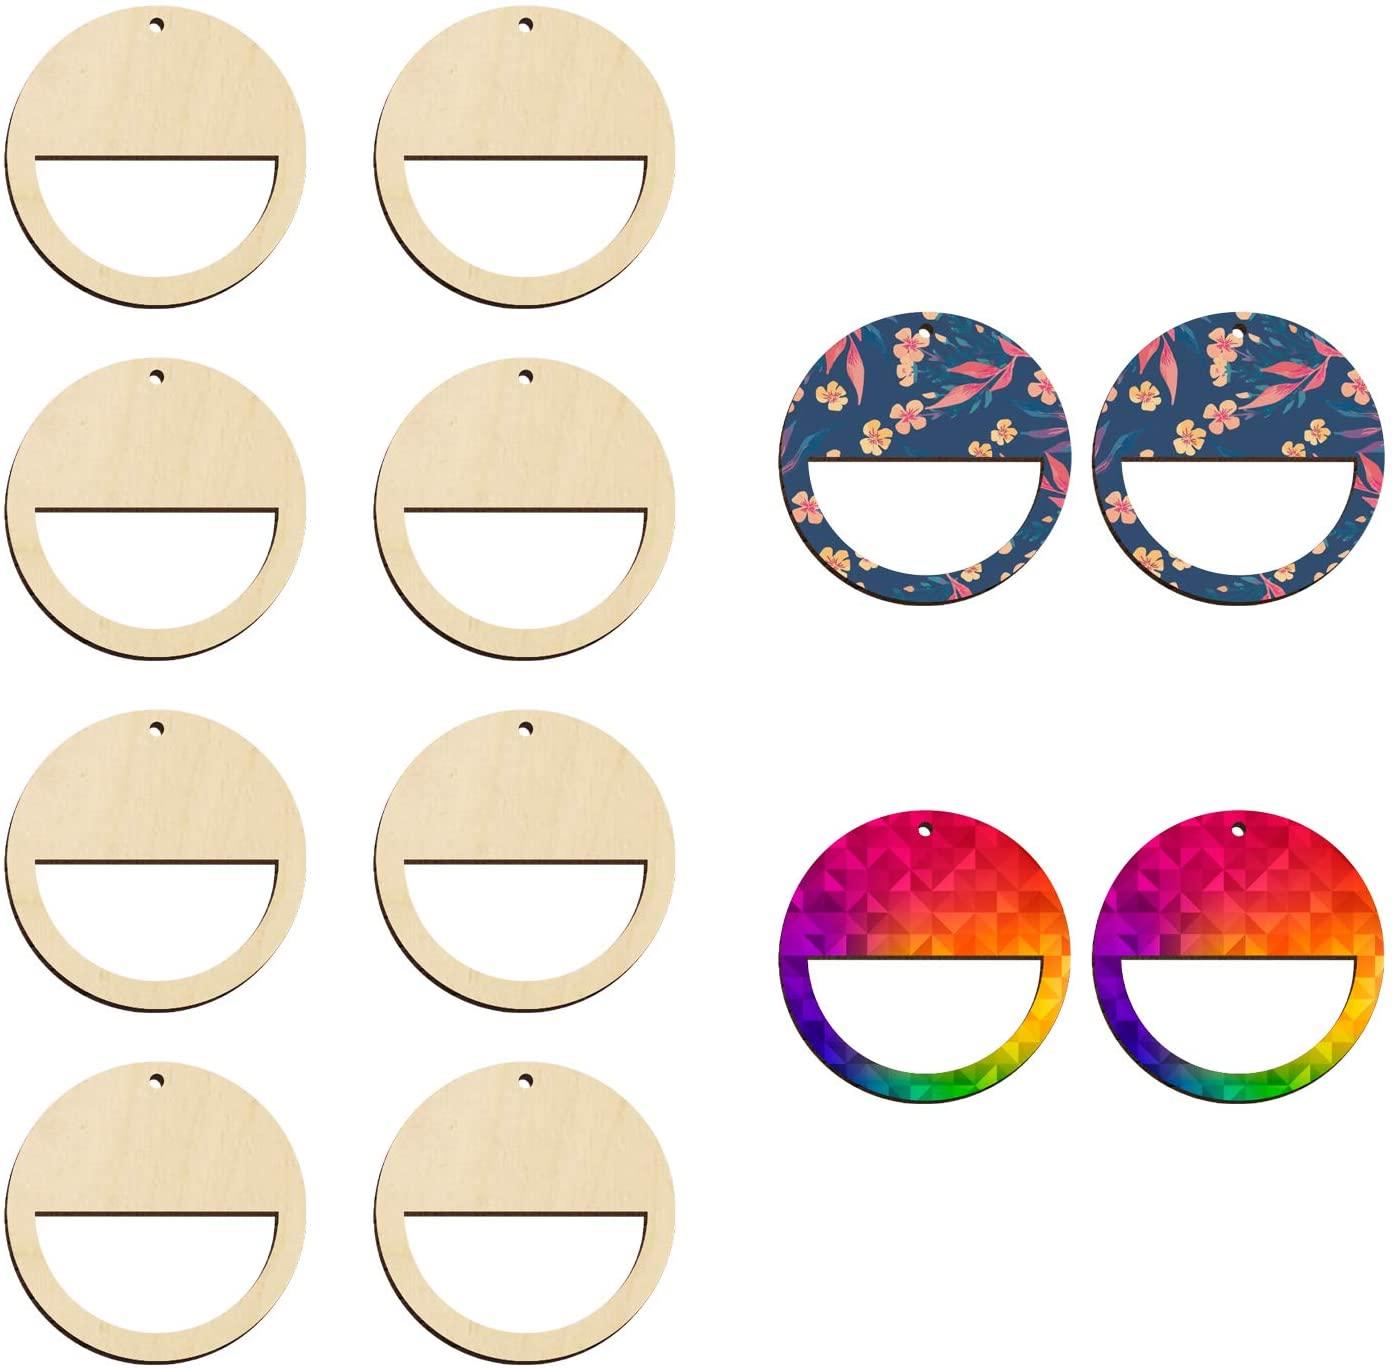 "Wood Circle Earring Blanks for Women Girls Unfinished Round Earrings for Jewelry Making Blank Earring Pendant Bulk DIY Lightweight Statement Dangle Earrings 2"" -36pcs"